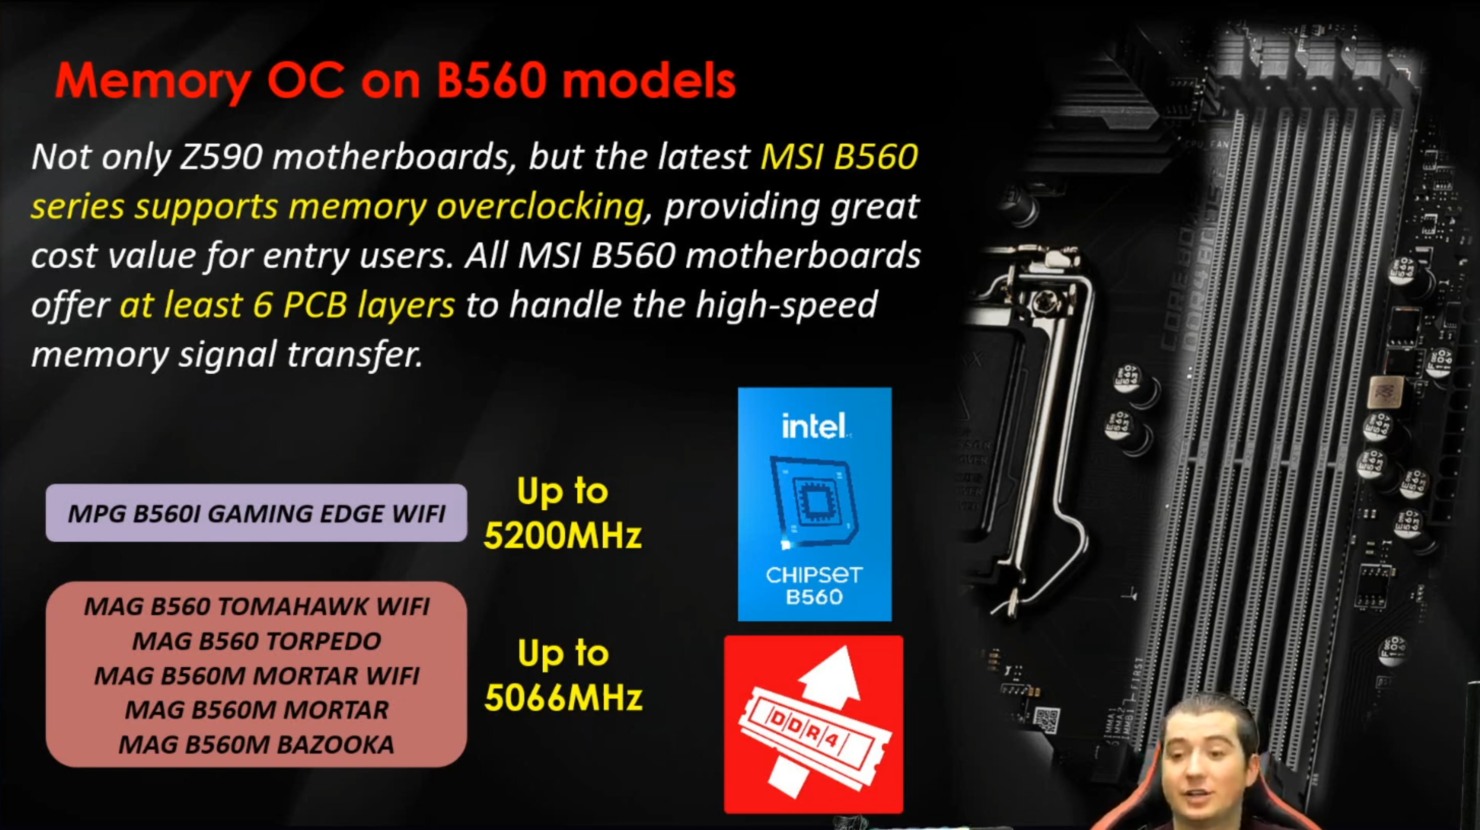 msi-b560-h510-motherboards-intel-10th-gen-11th-gen-desktop-cpus-_-prices-specs-_-memory-overclock-_1